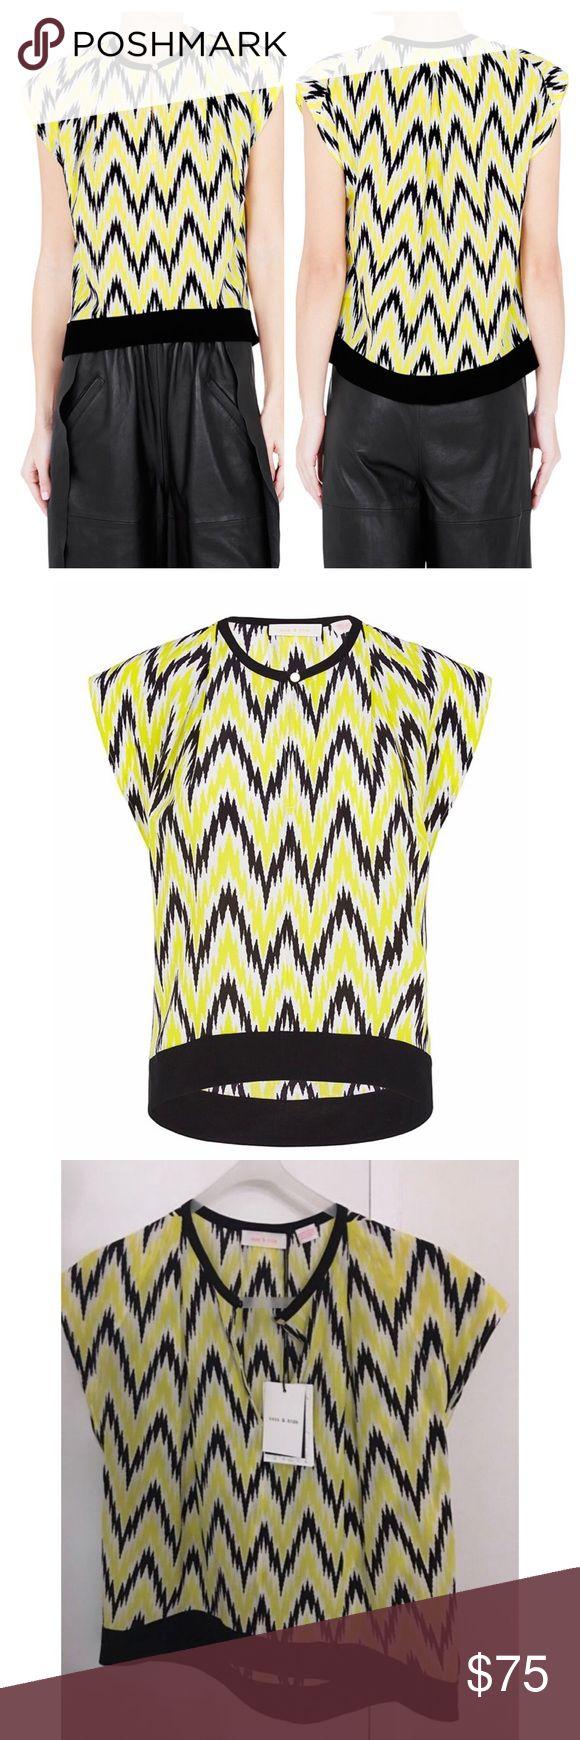 "NWT Sass & Bide Robotic Agent Silk Chevron Top Brand-new with tag Sass & Bide blouse. Fabulous Australian designer. Robotic agent style. Yellow and black chevron print. 100% silk. Size 2, 21"" in front, 24"" back 💕 sass & bide Tops Blouses"